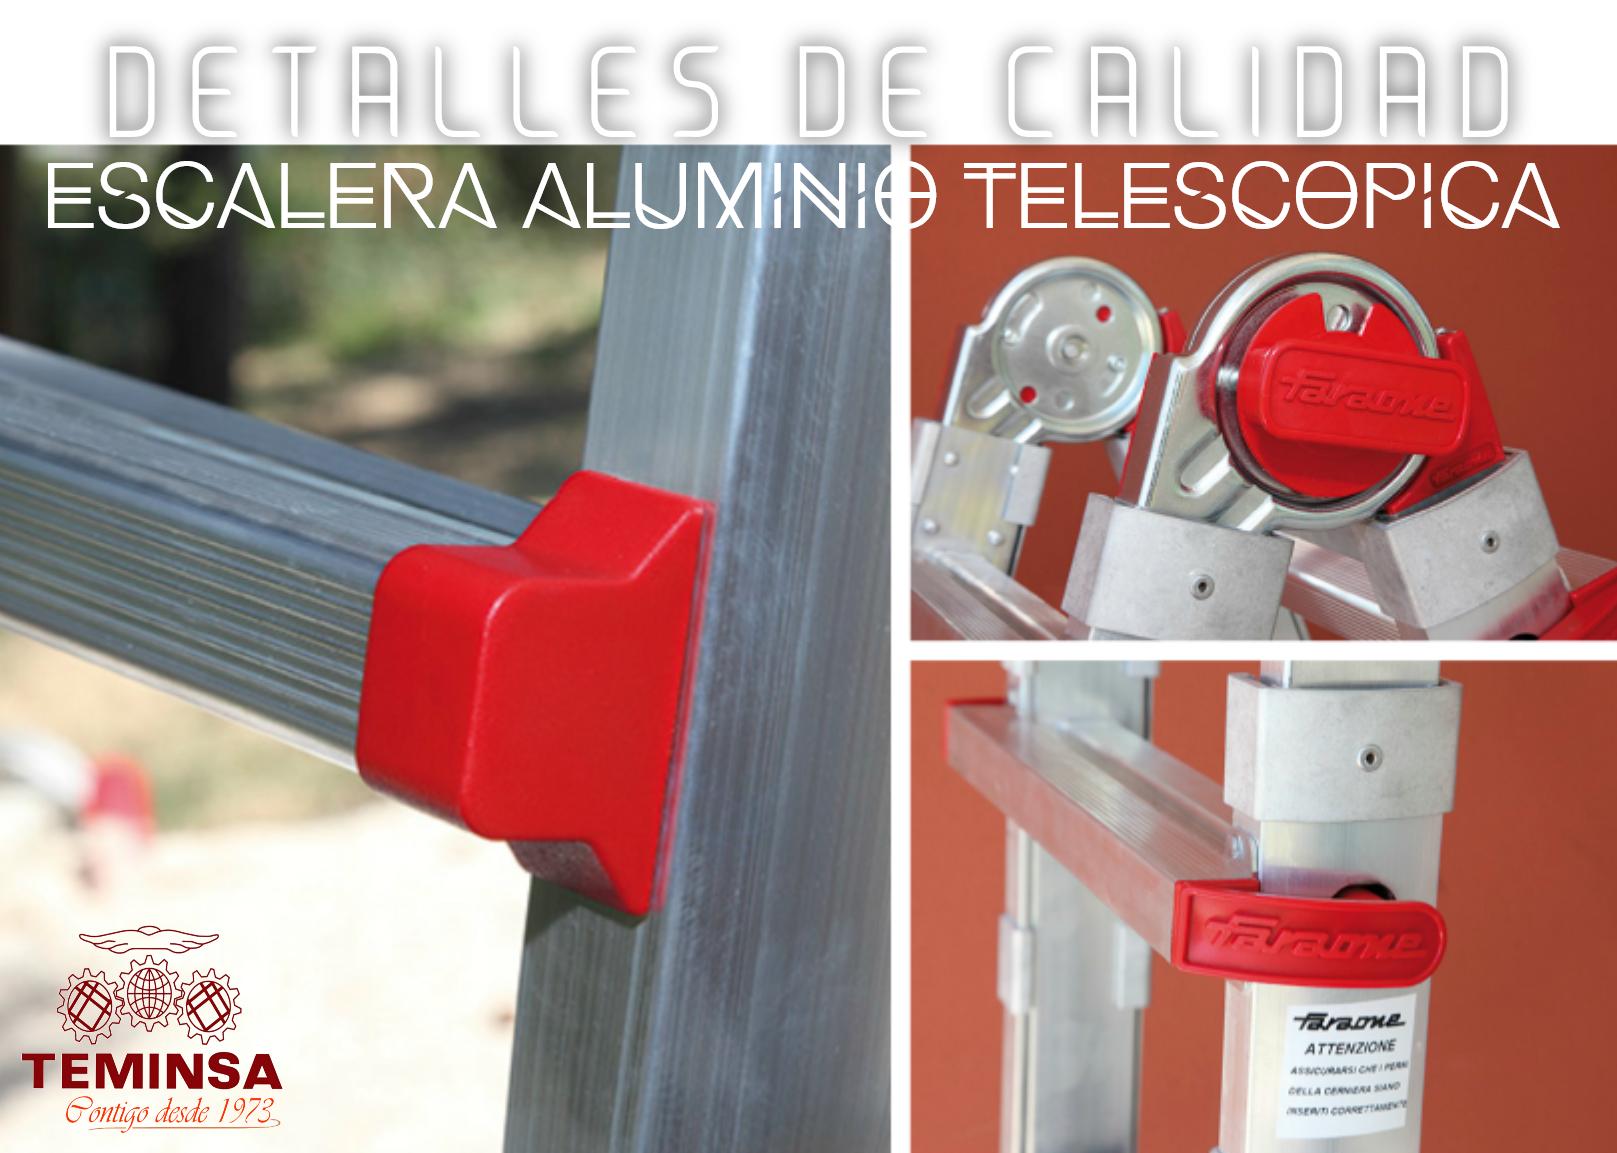 Escalera Aluminio Telescópica Detalles de Calidad